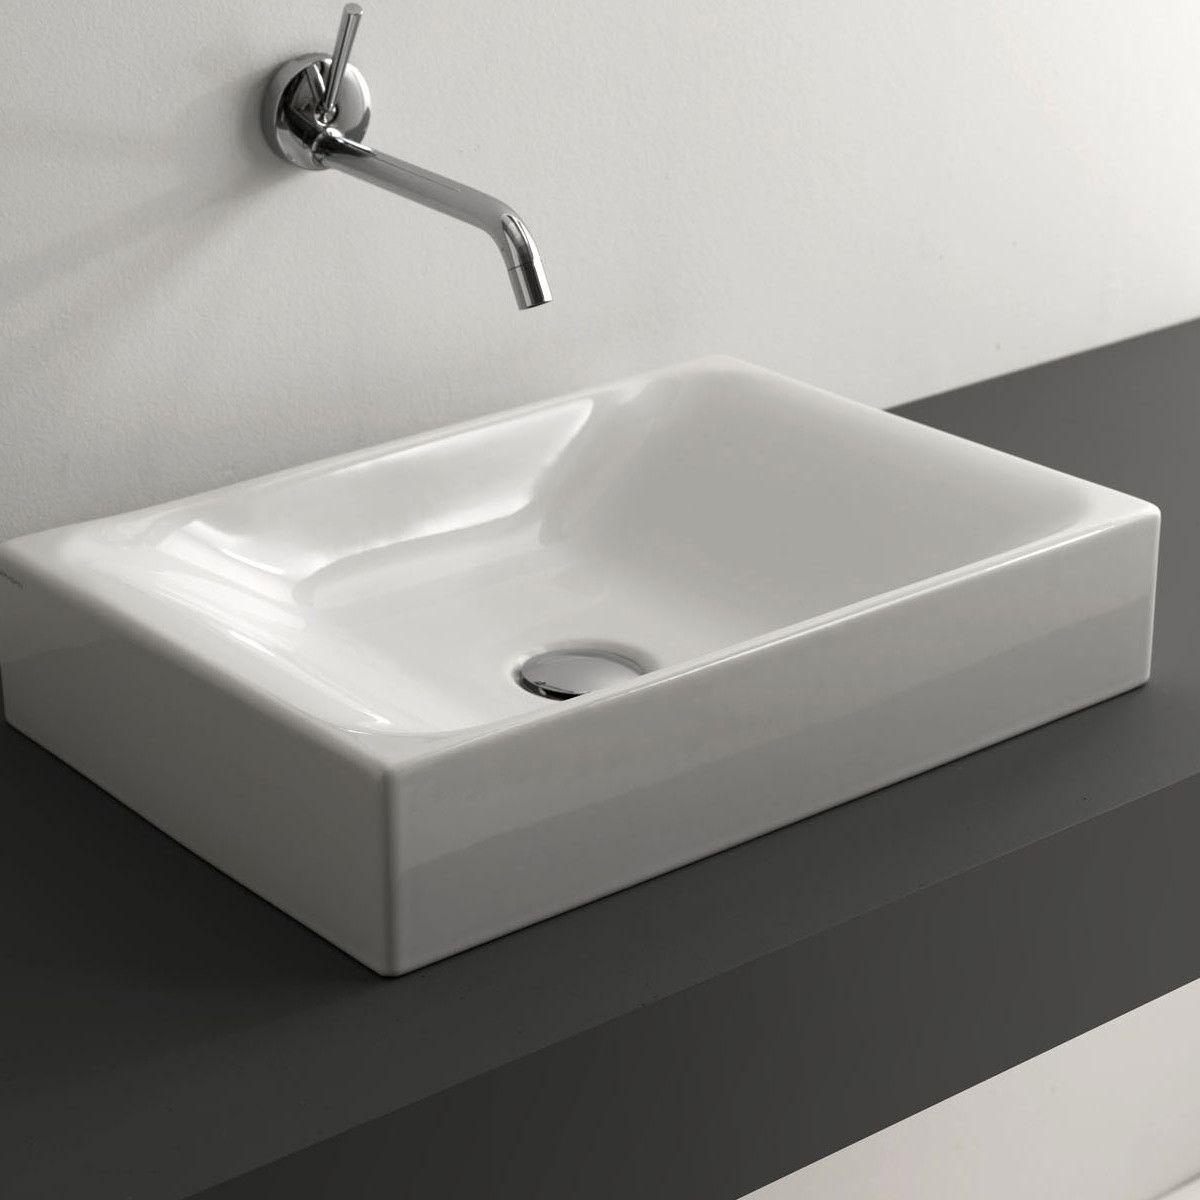 Cento Ceramic Ceramic Rectangular Vessel Bathroom Sink Bathroom Sink Ws Bath Collections Contemporary Bathroom Sinks